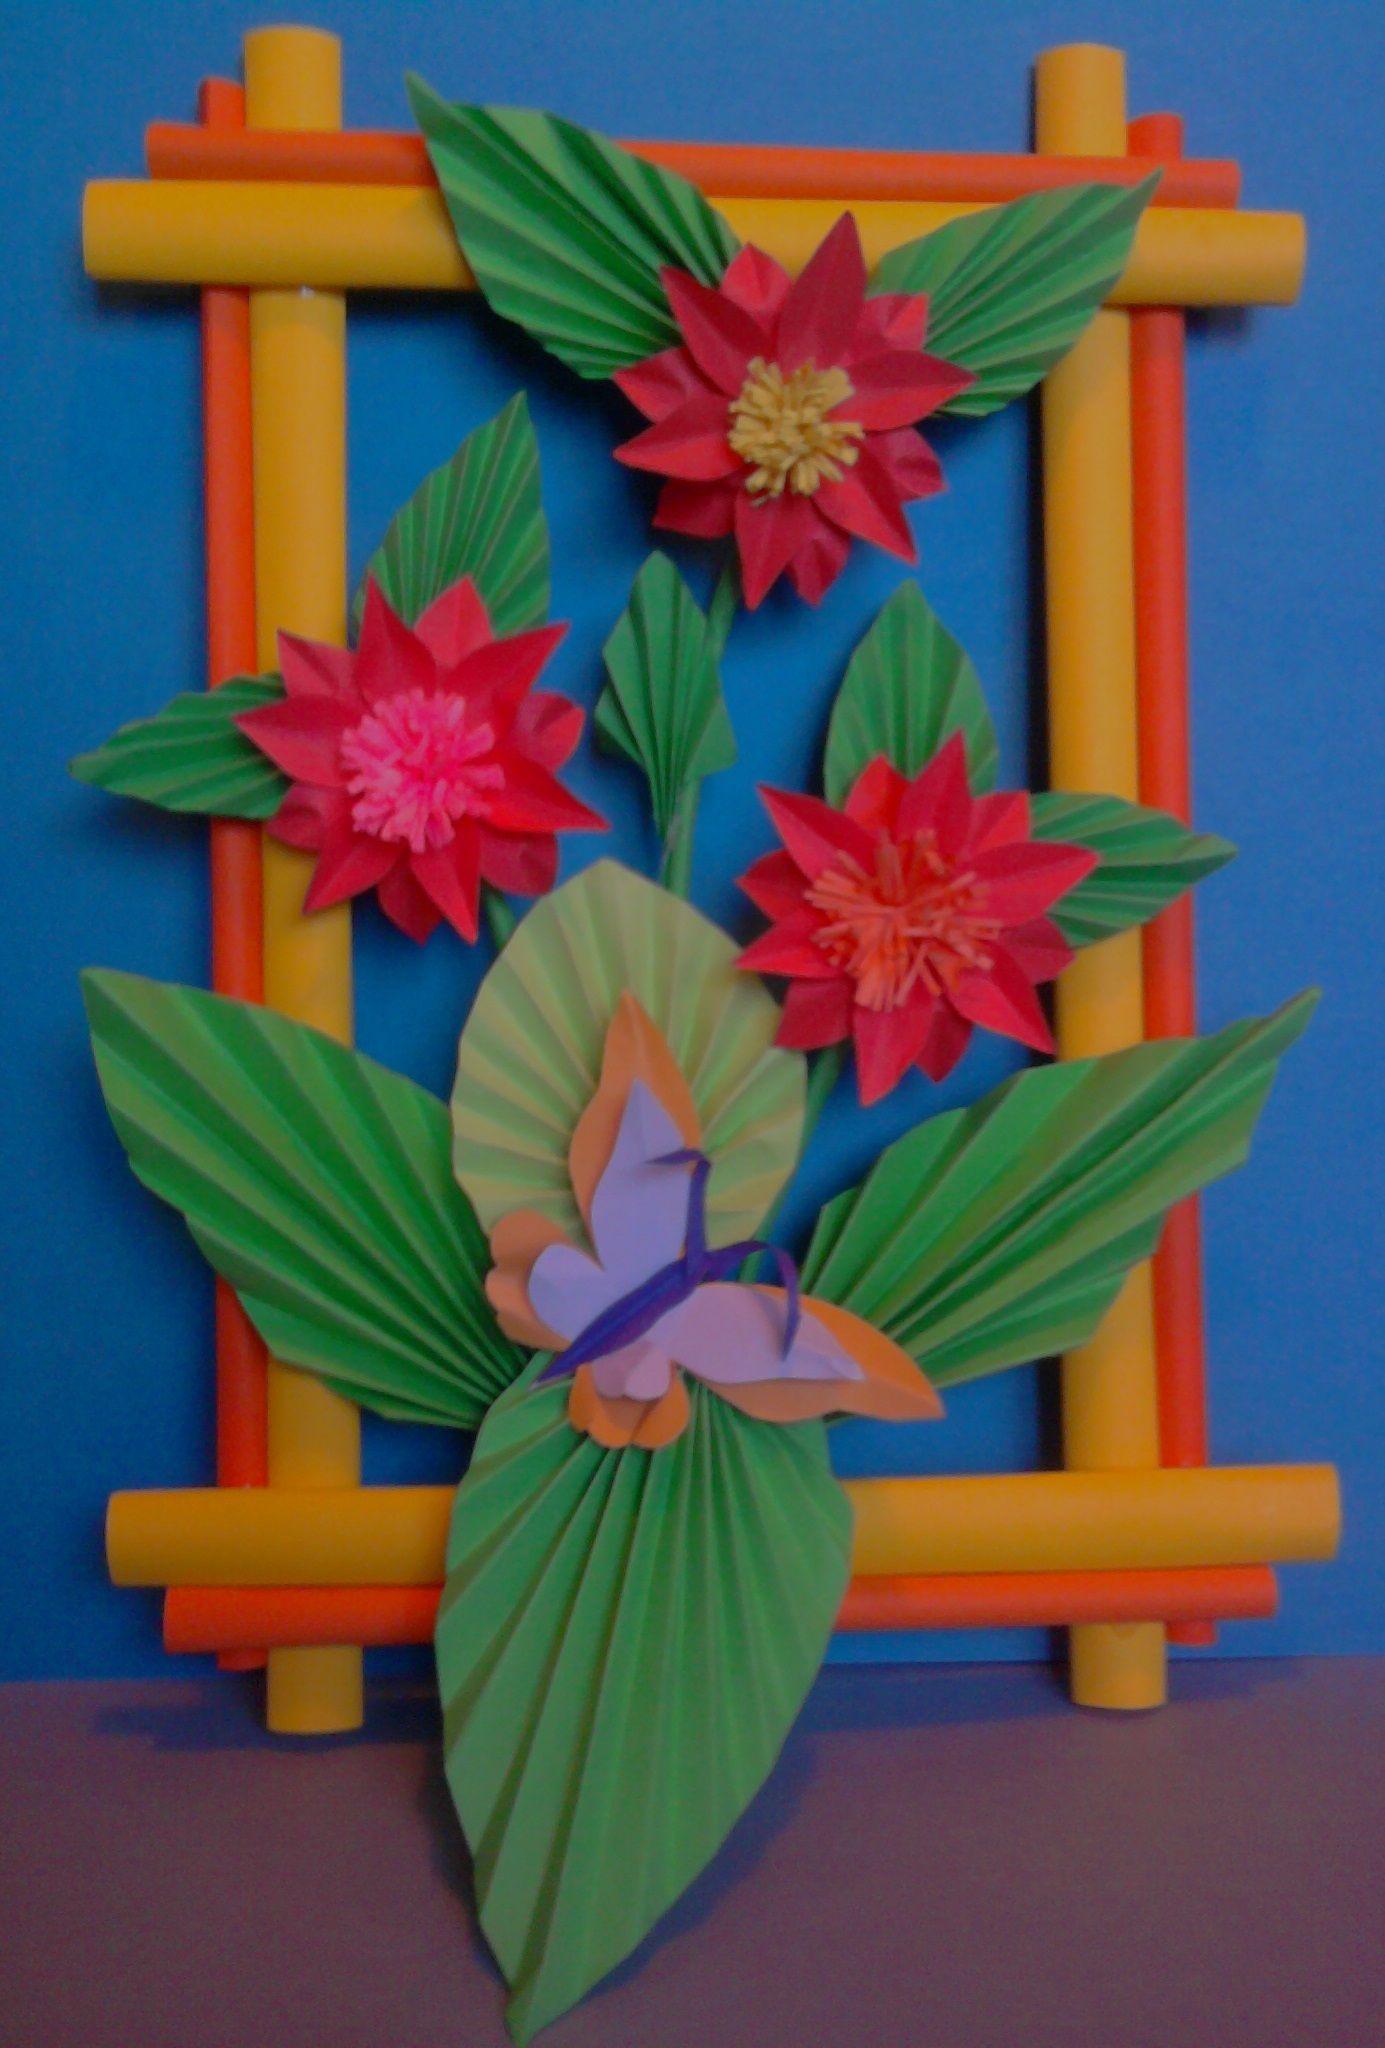 Kwiaty Z Papieru Ikebana Prace Plastyczne Dariusz Zolynski Flowers Paper Paper Flowers Orgiami K Manualidades Manualidades Para Ninos Flores De Papel